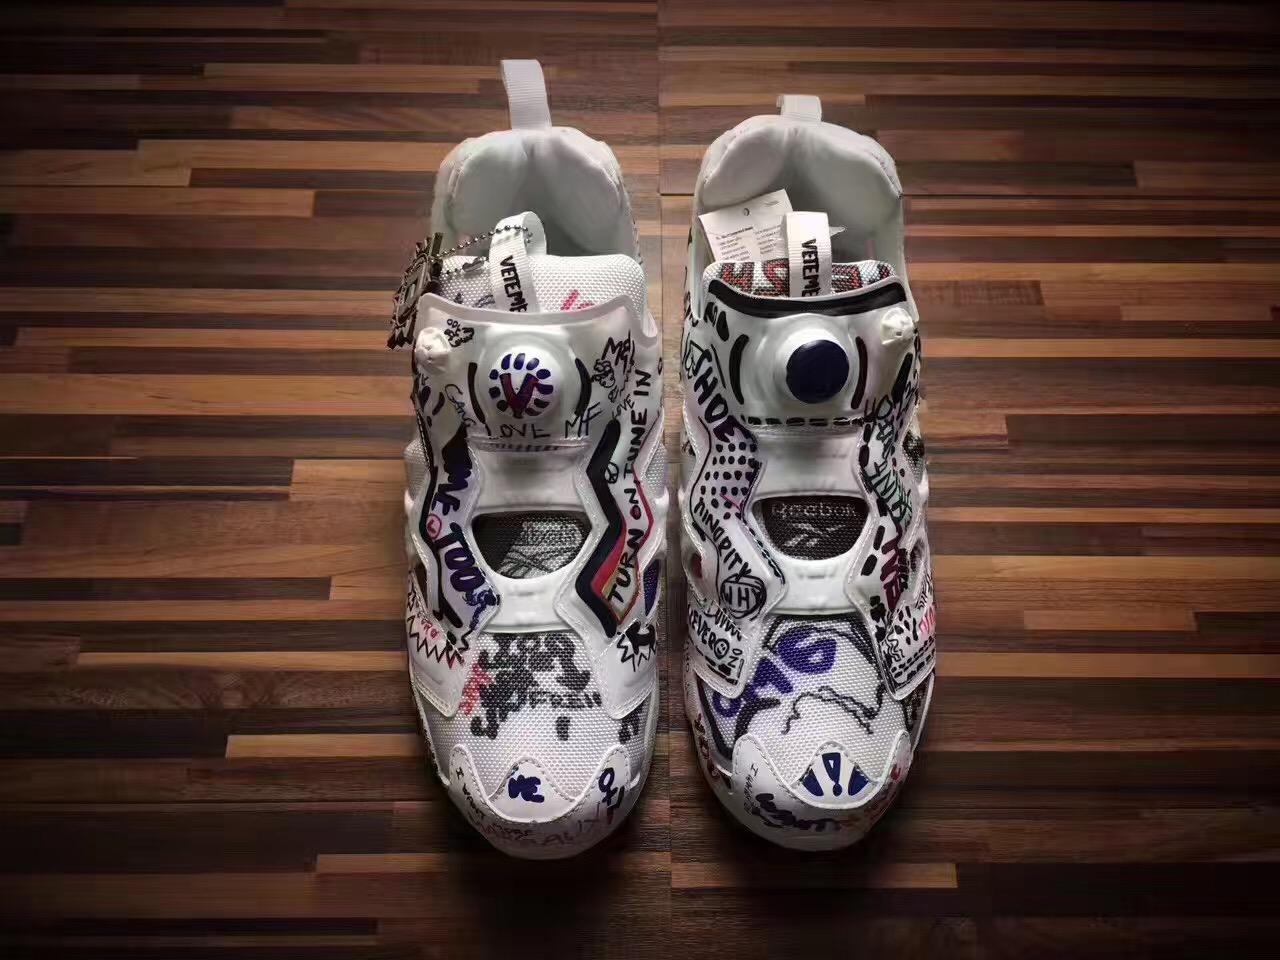 768dfa295d9f Falection 17fw Vetements x Reebok Insta Pump Fury Grafitti Sneakers Item  NO  62627